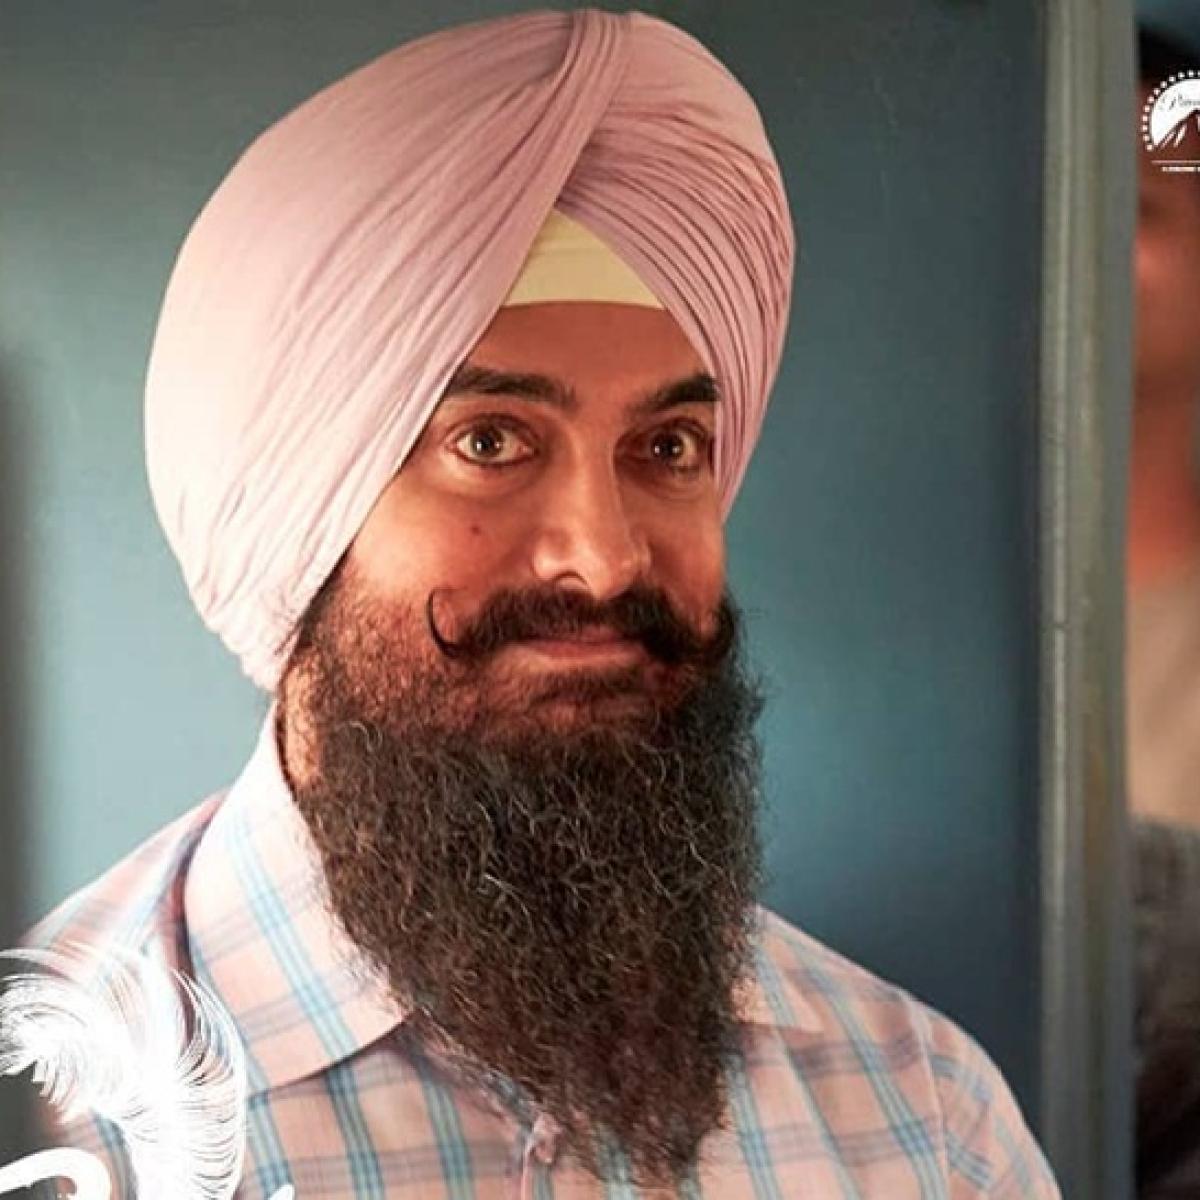 Aamir Khan to shoot in Kargil for 'Laal Singh Chaddha'?